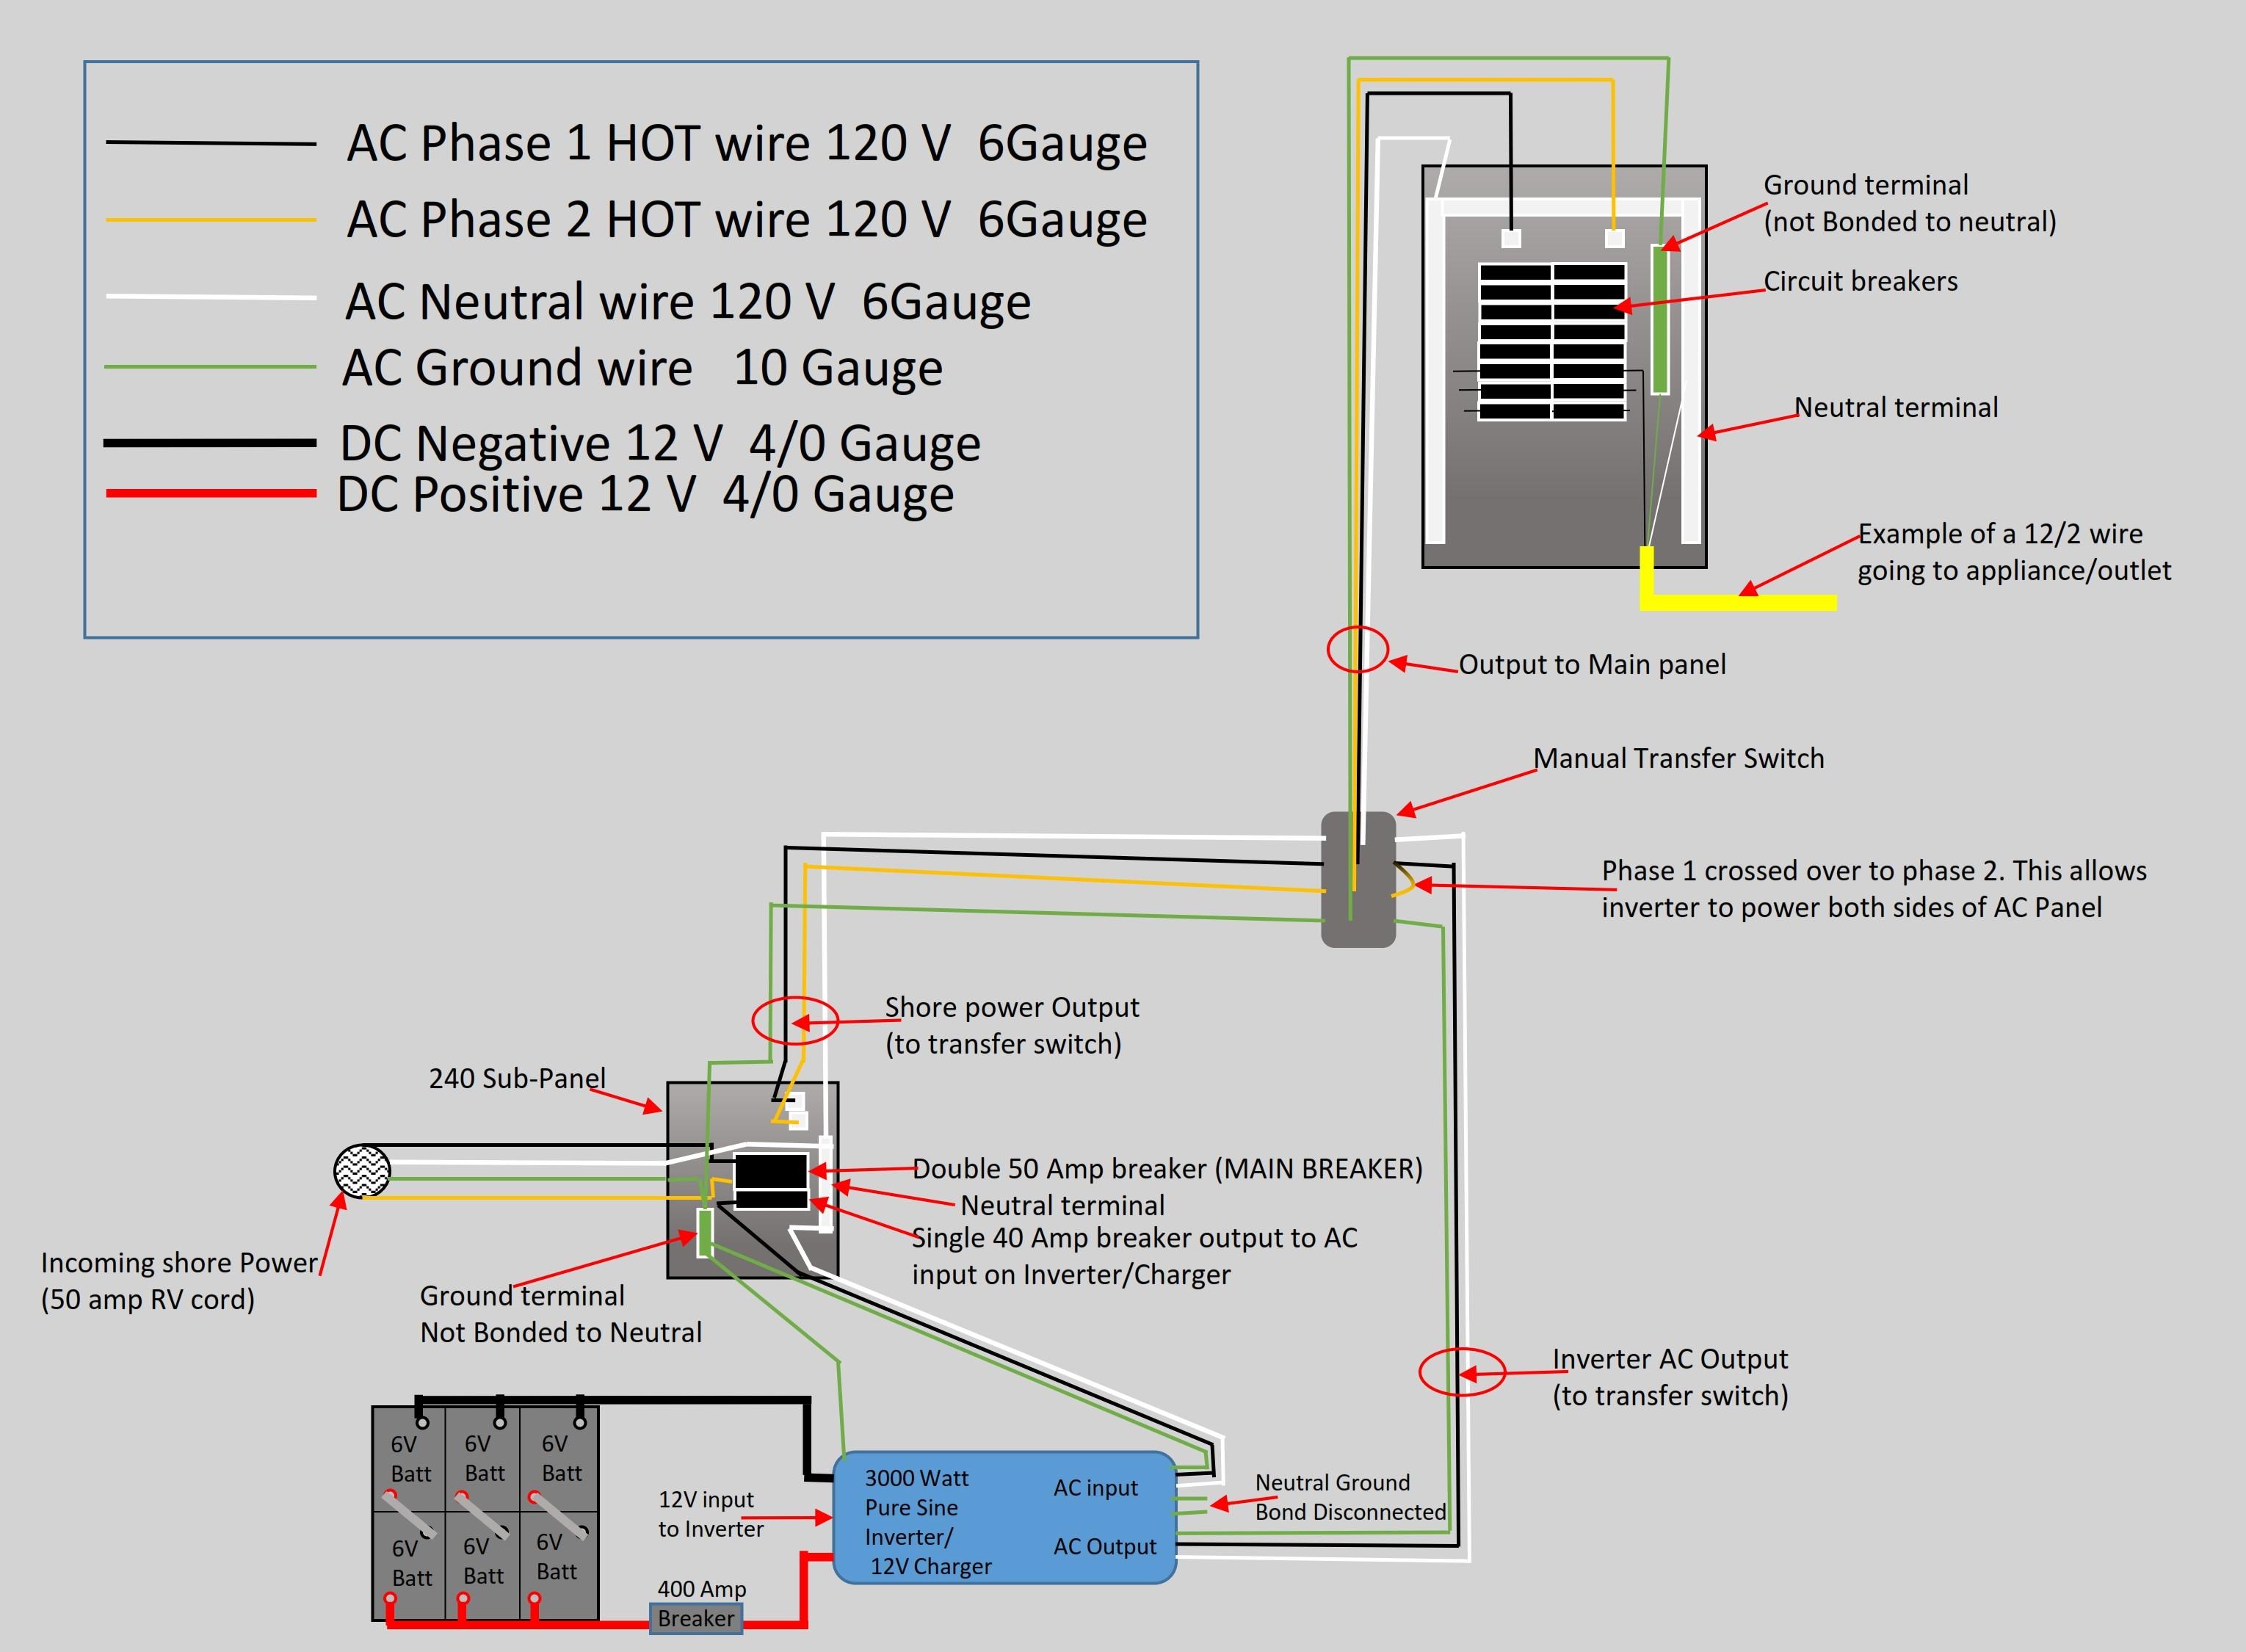 medium resolution of a c wiring u2013 tatum skoolie u2013 school bus conversion50 amp rv wiring diagram main